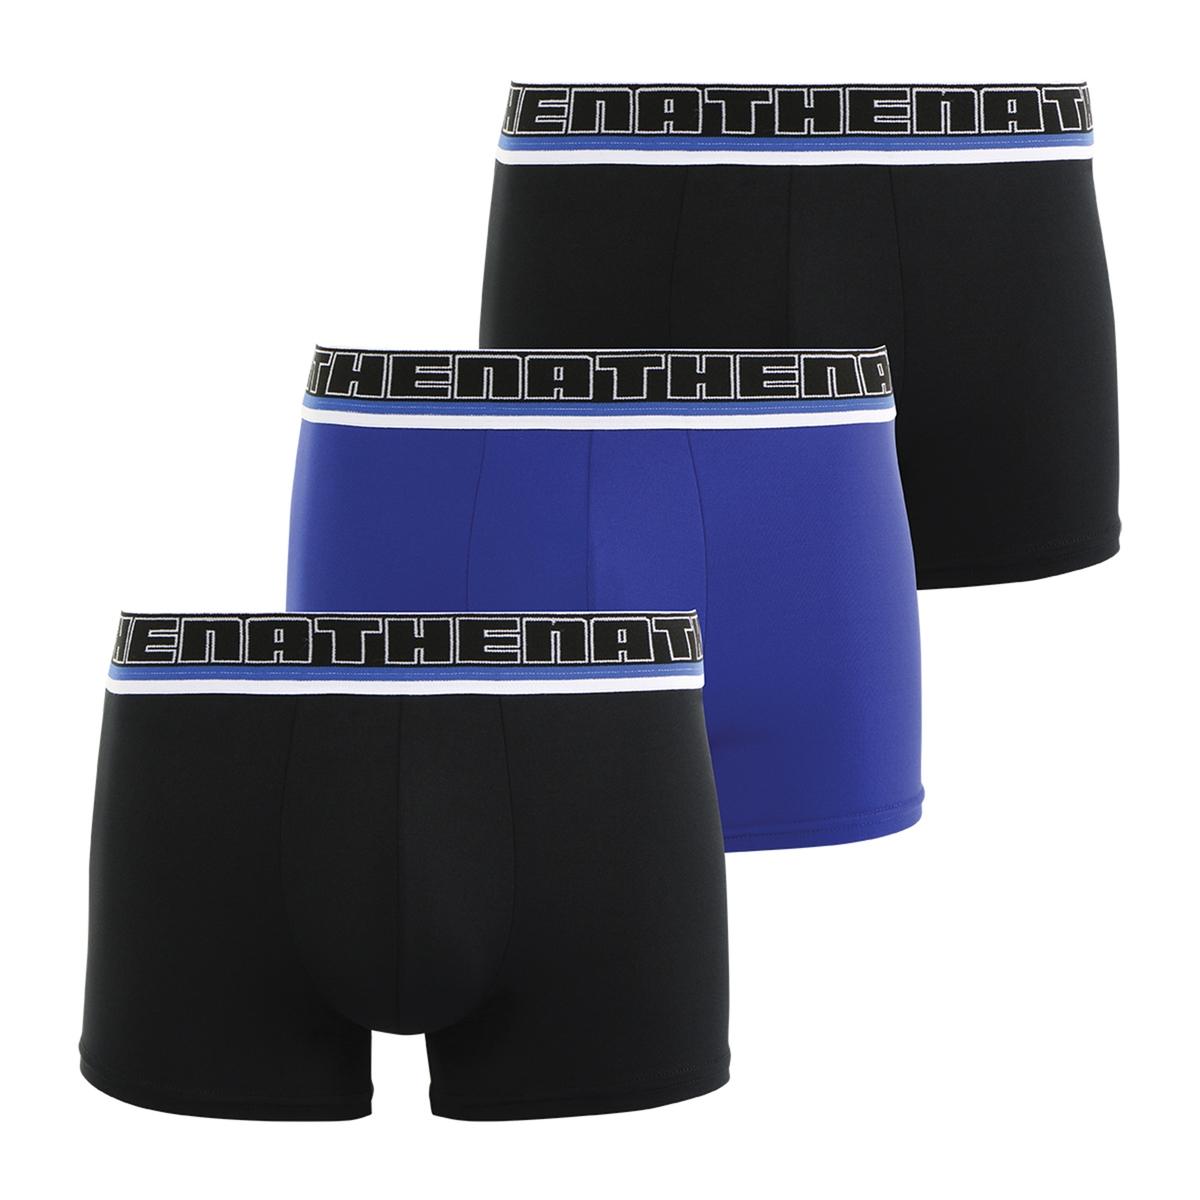 Трусы-боксеры, комплект из 3 штук